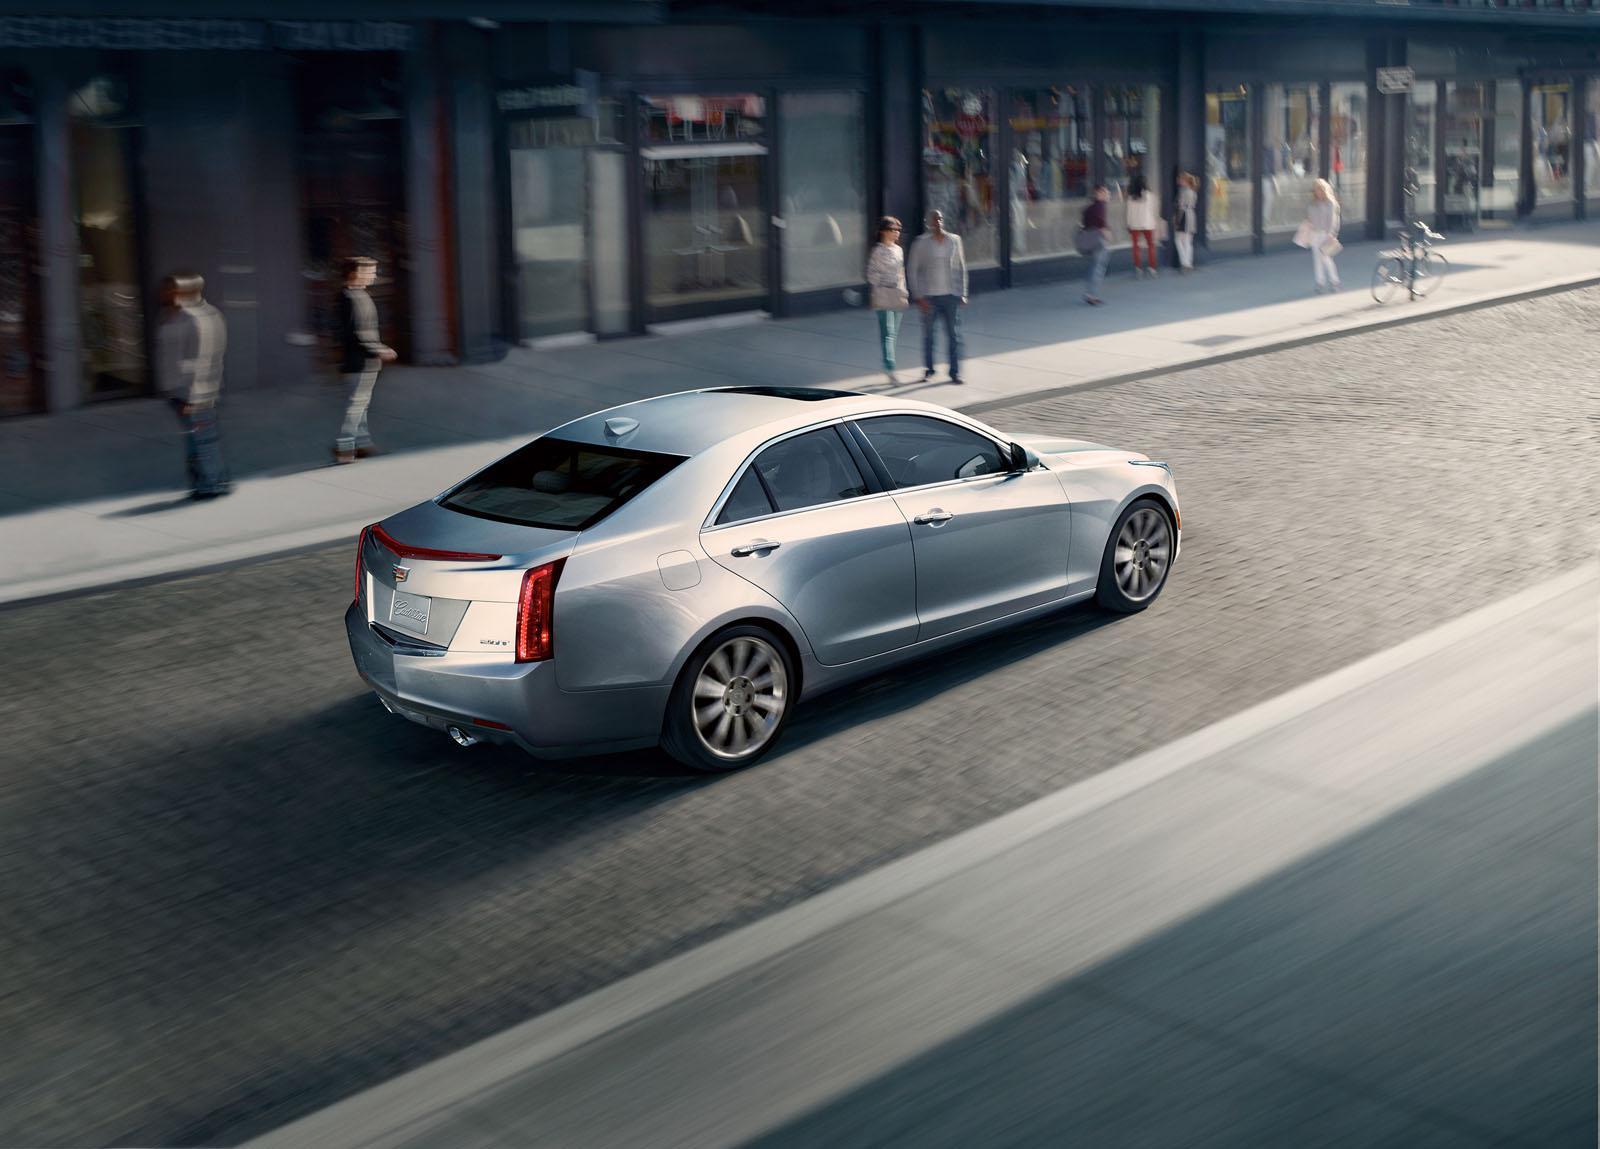 2015 cadillac ats sedan officially unveiled autoevolution. Black Bedroom Furniture Sets. Home Design Ideas